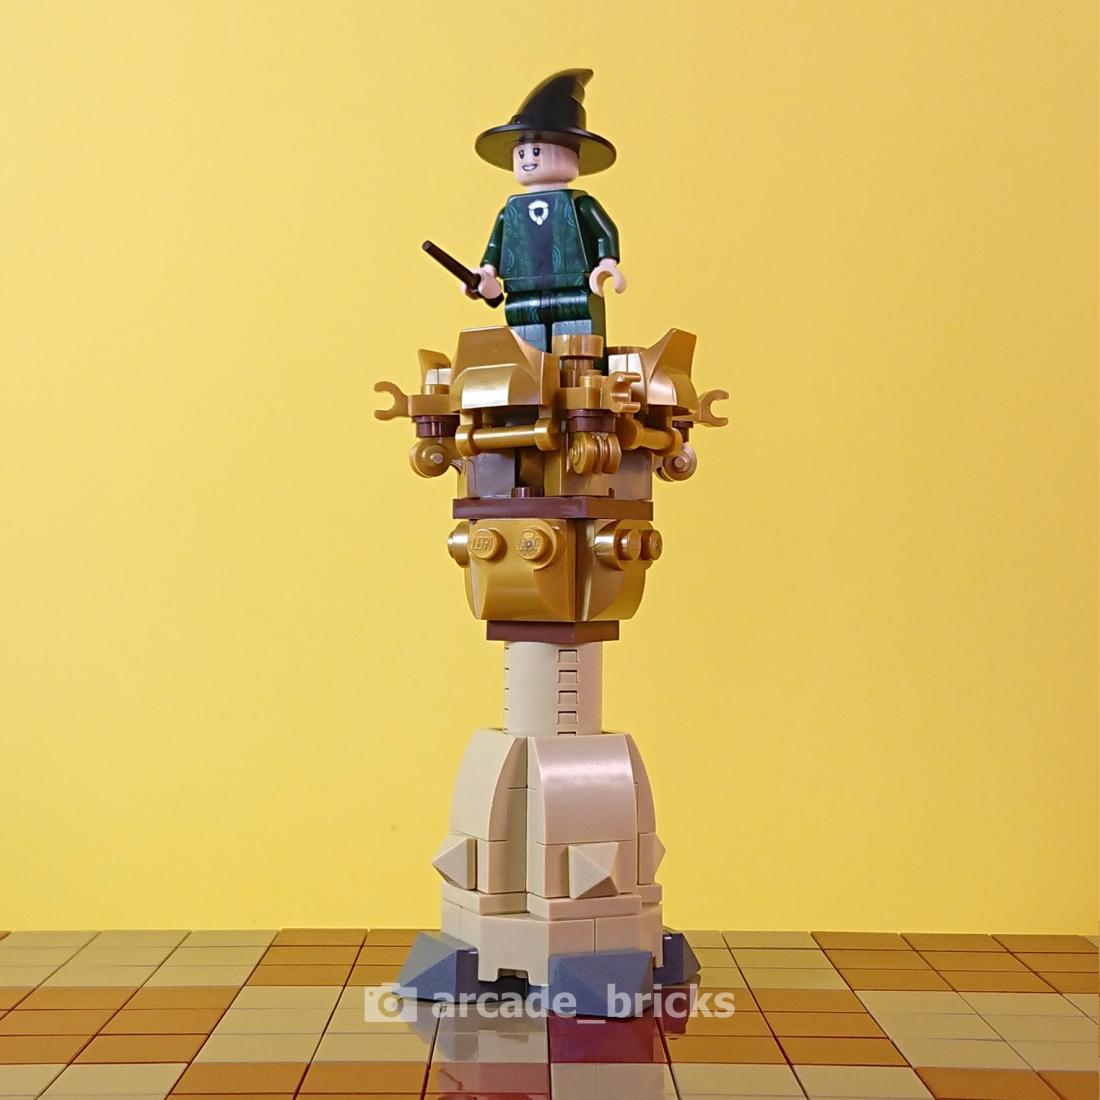 arcade_bricks_chess_good_02_queen